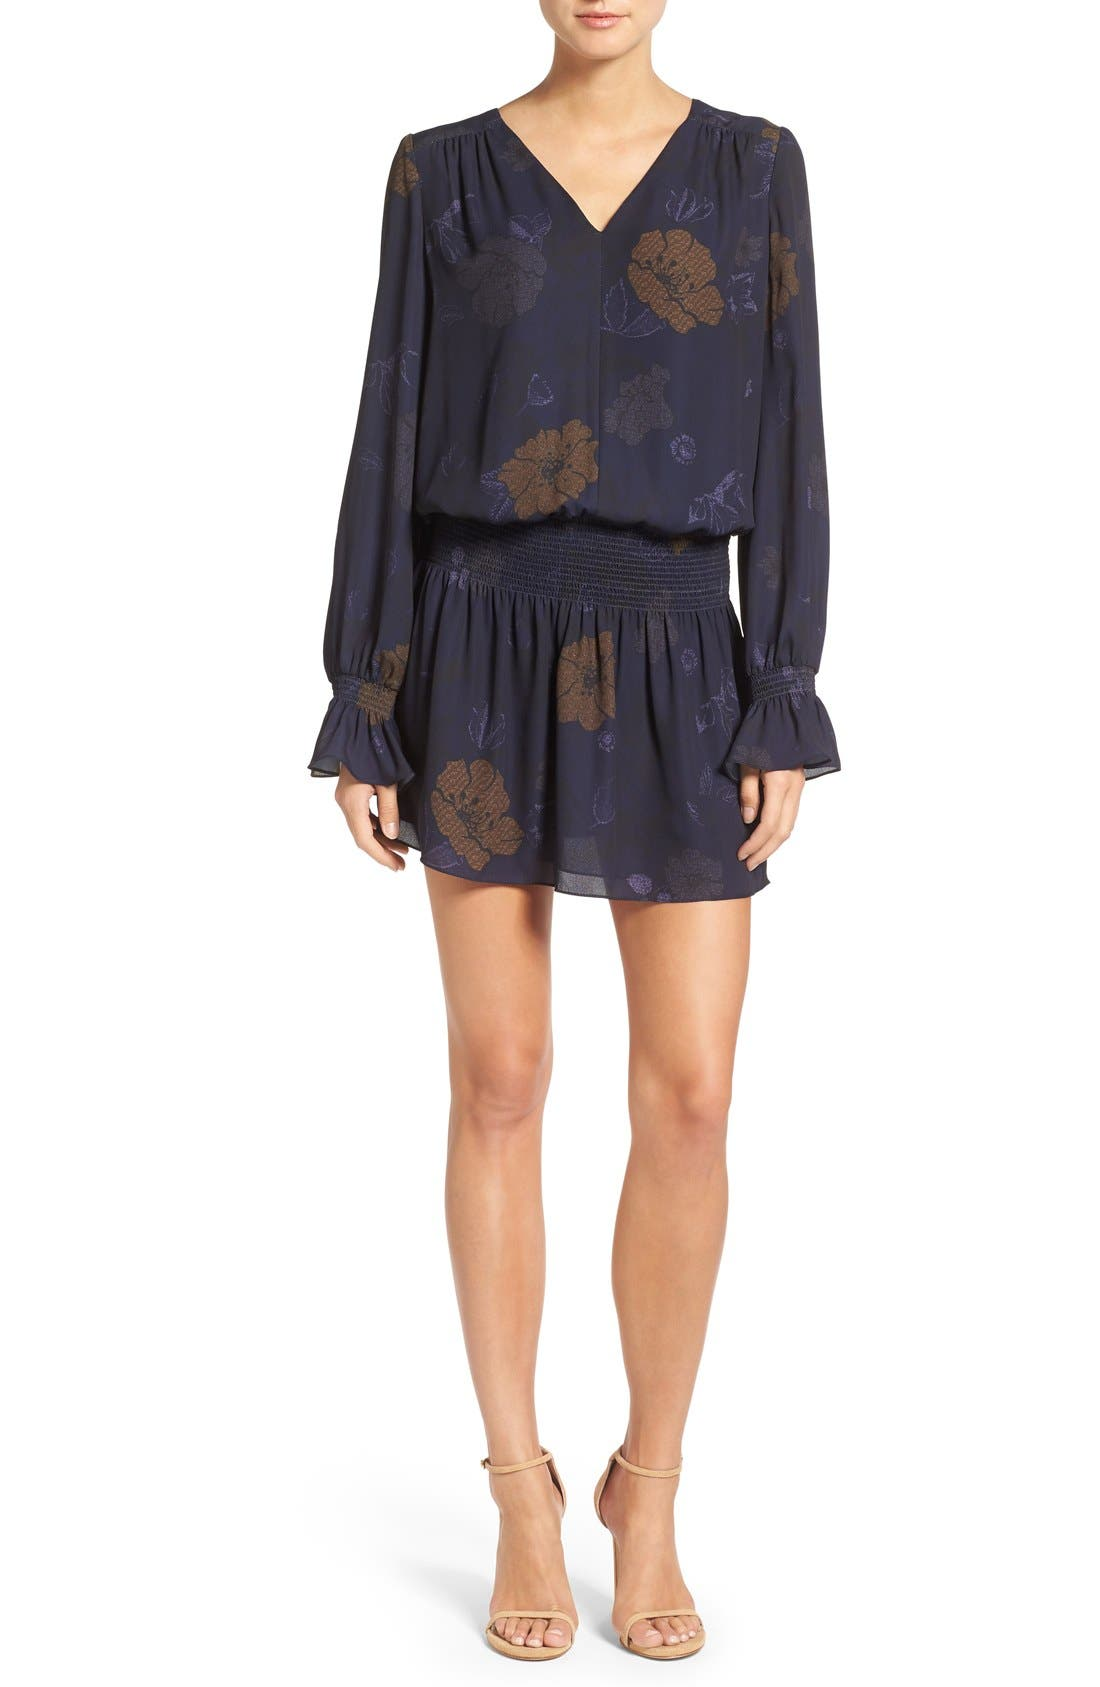 Alternate Image 1 Selected - Chelsea28 Drop Waist Dress